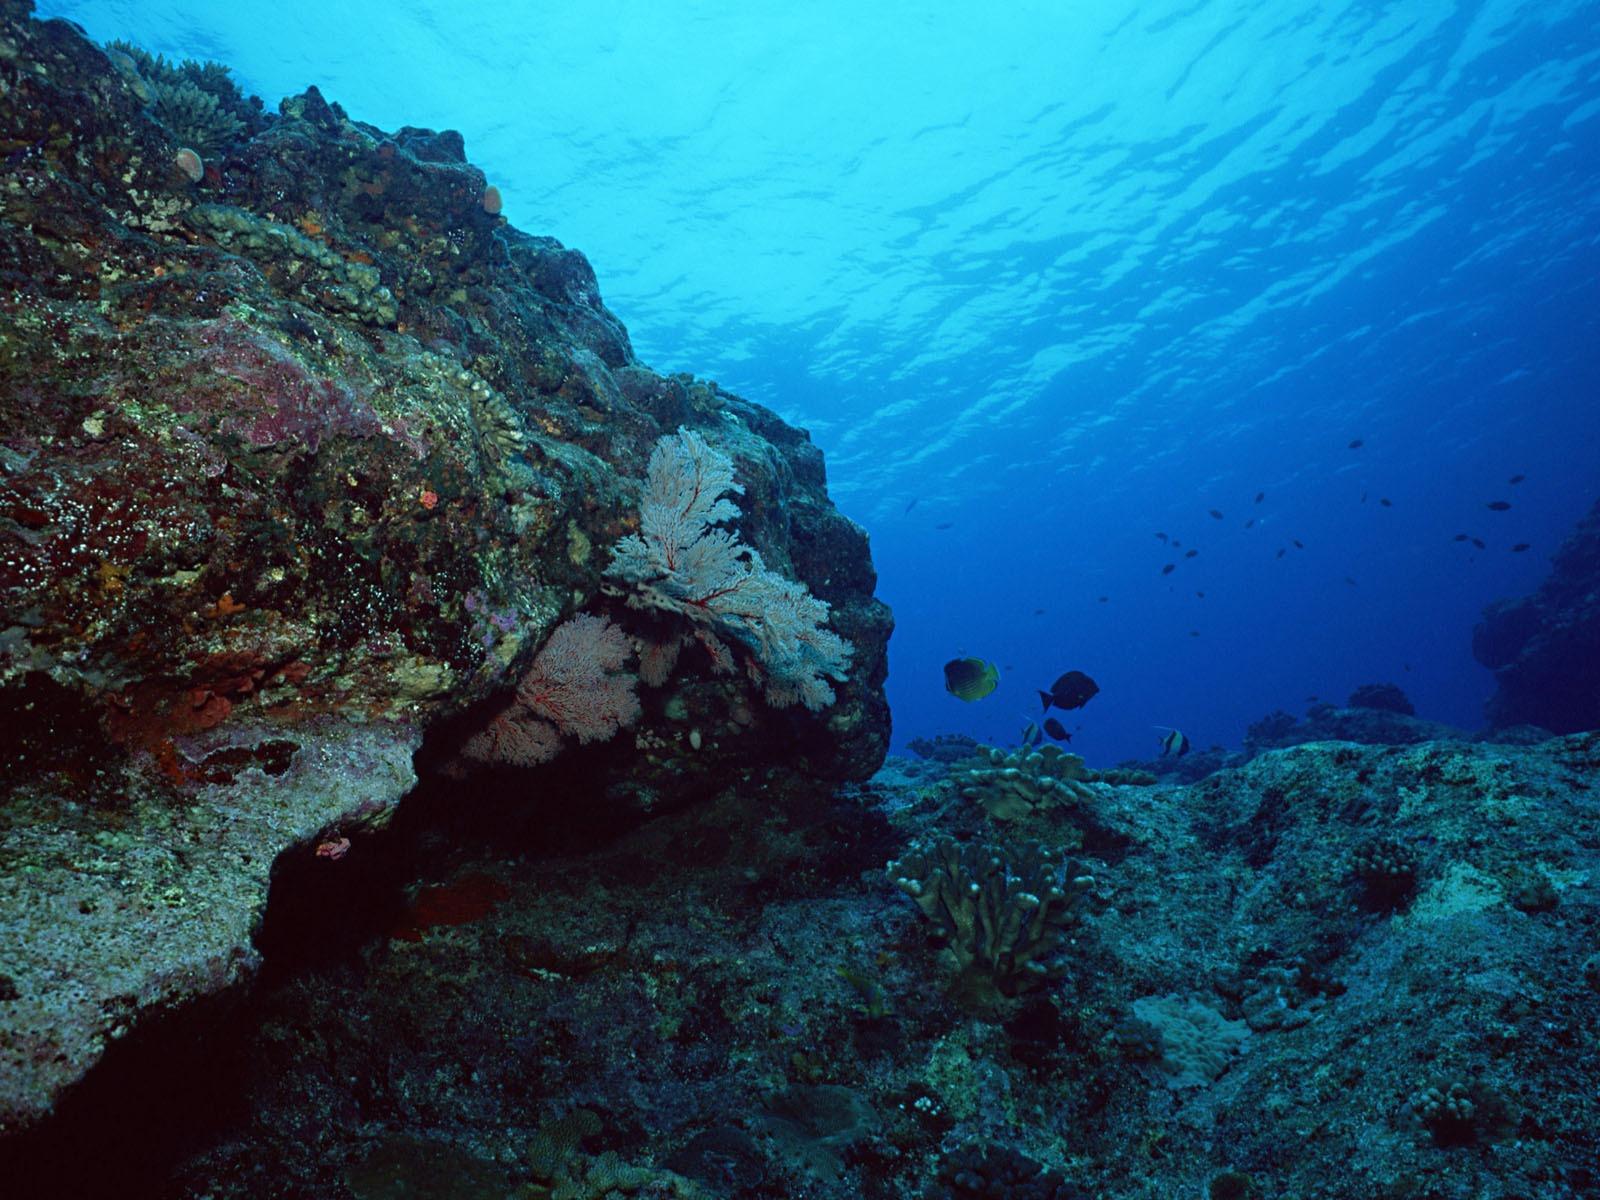 Deep Blue Underwater World Wallpaper 17 1600x1200